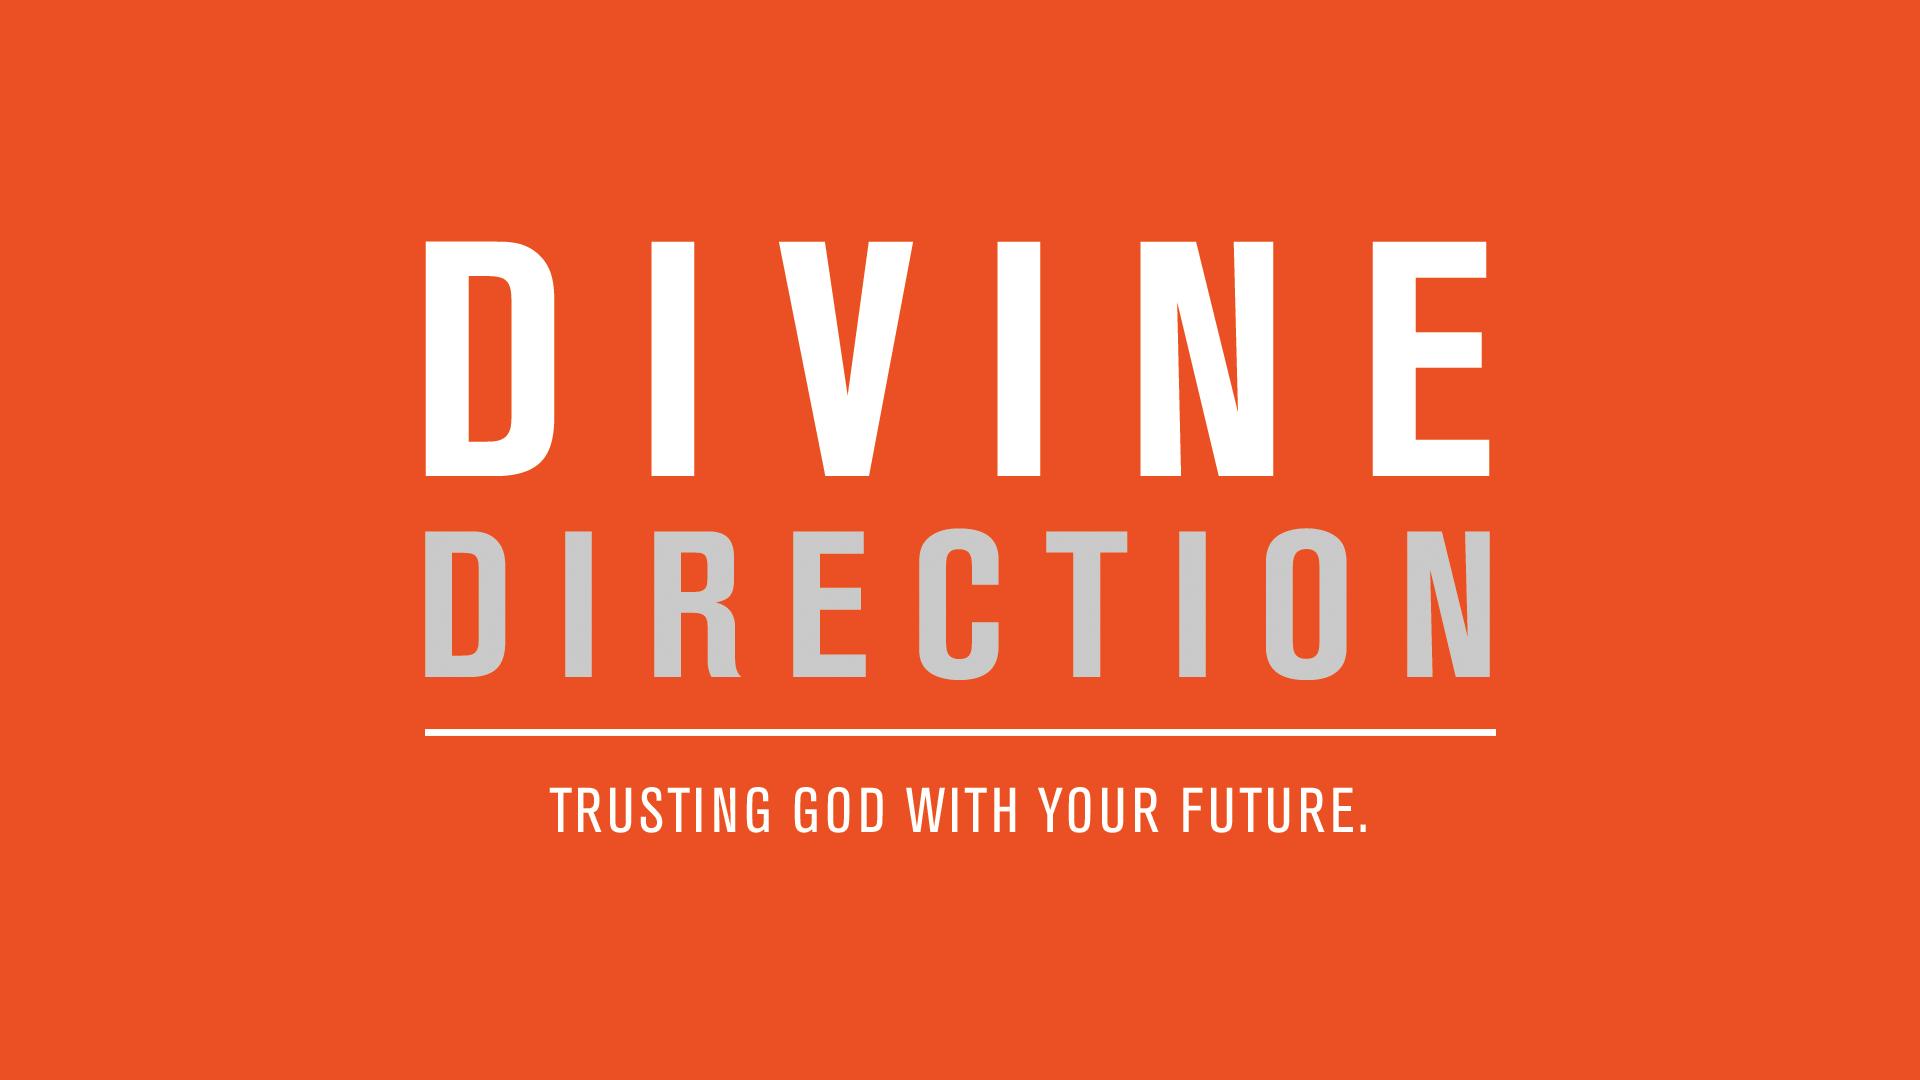 DivineDirection_HERO.png